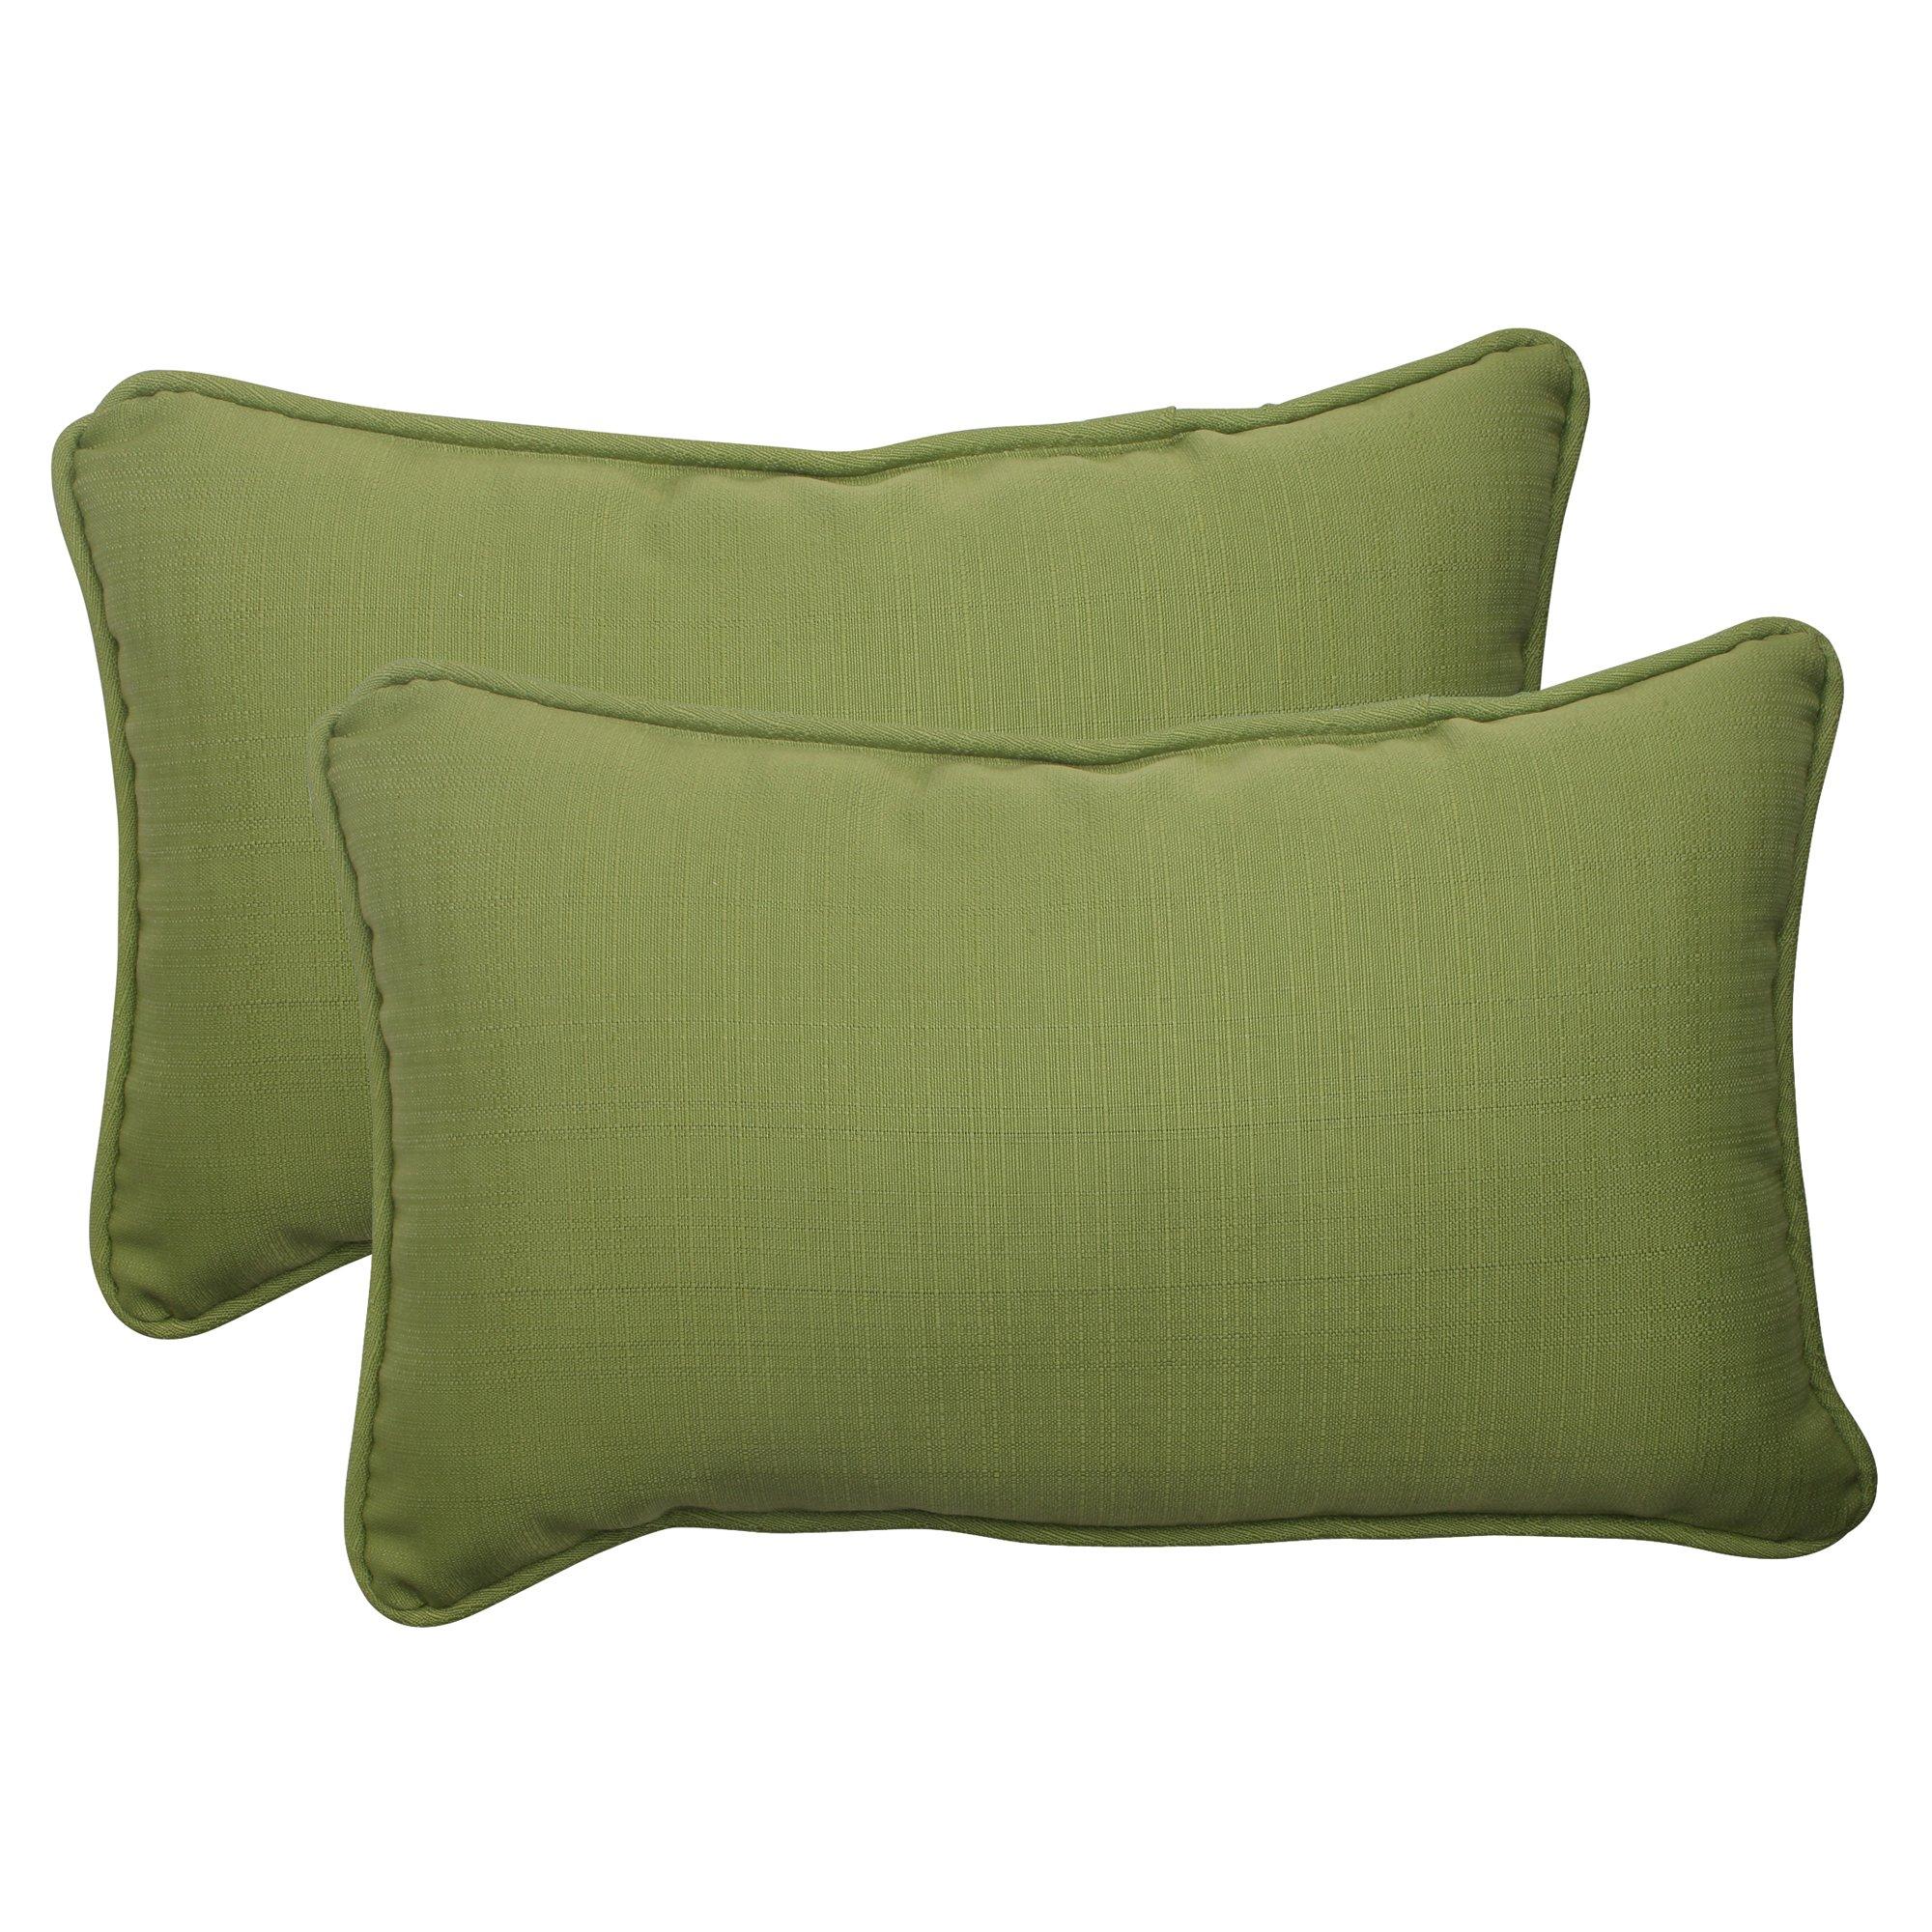 Pillow Perfect Outdoor Forsyth Corded Rectangular Throw Pillow, Green, Set of 2